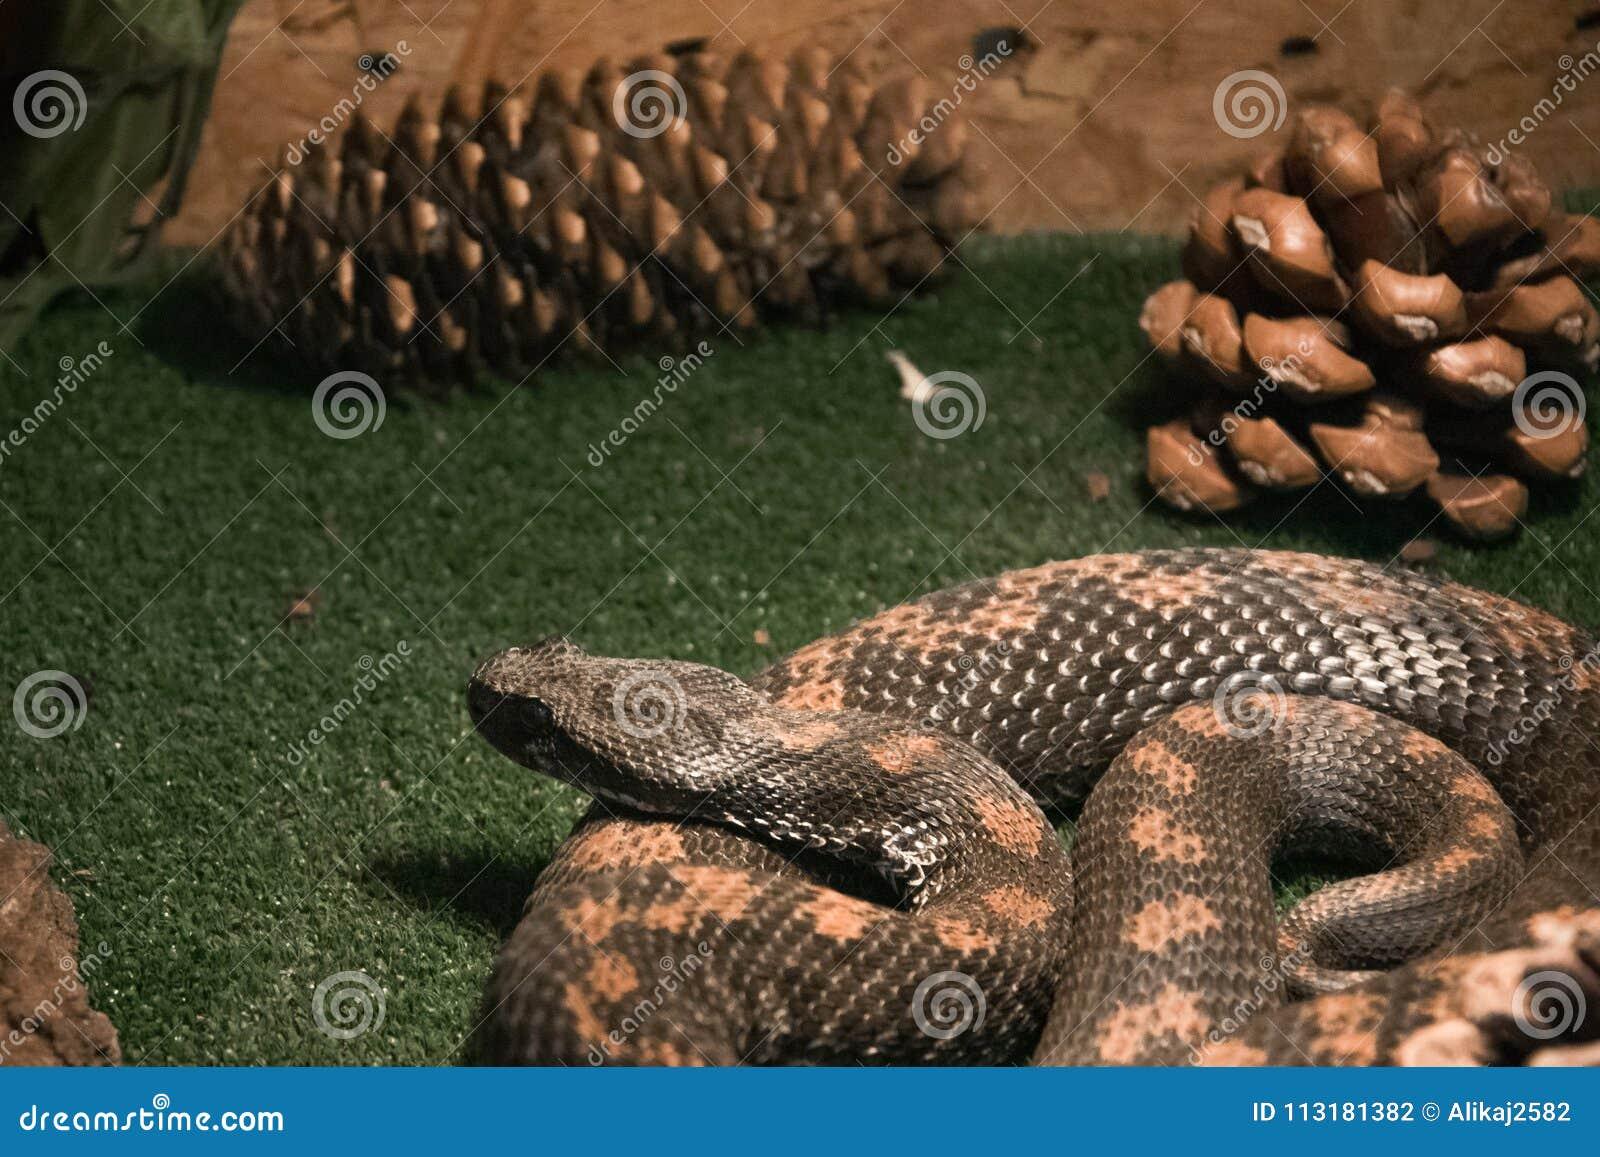 Dangerous Poisonous Snake In The Terrarium Armenian Viper Stock